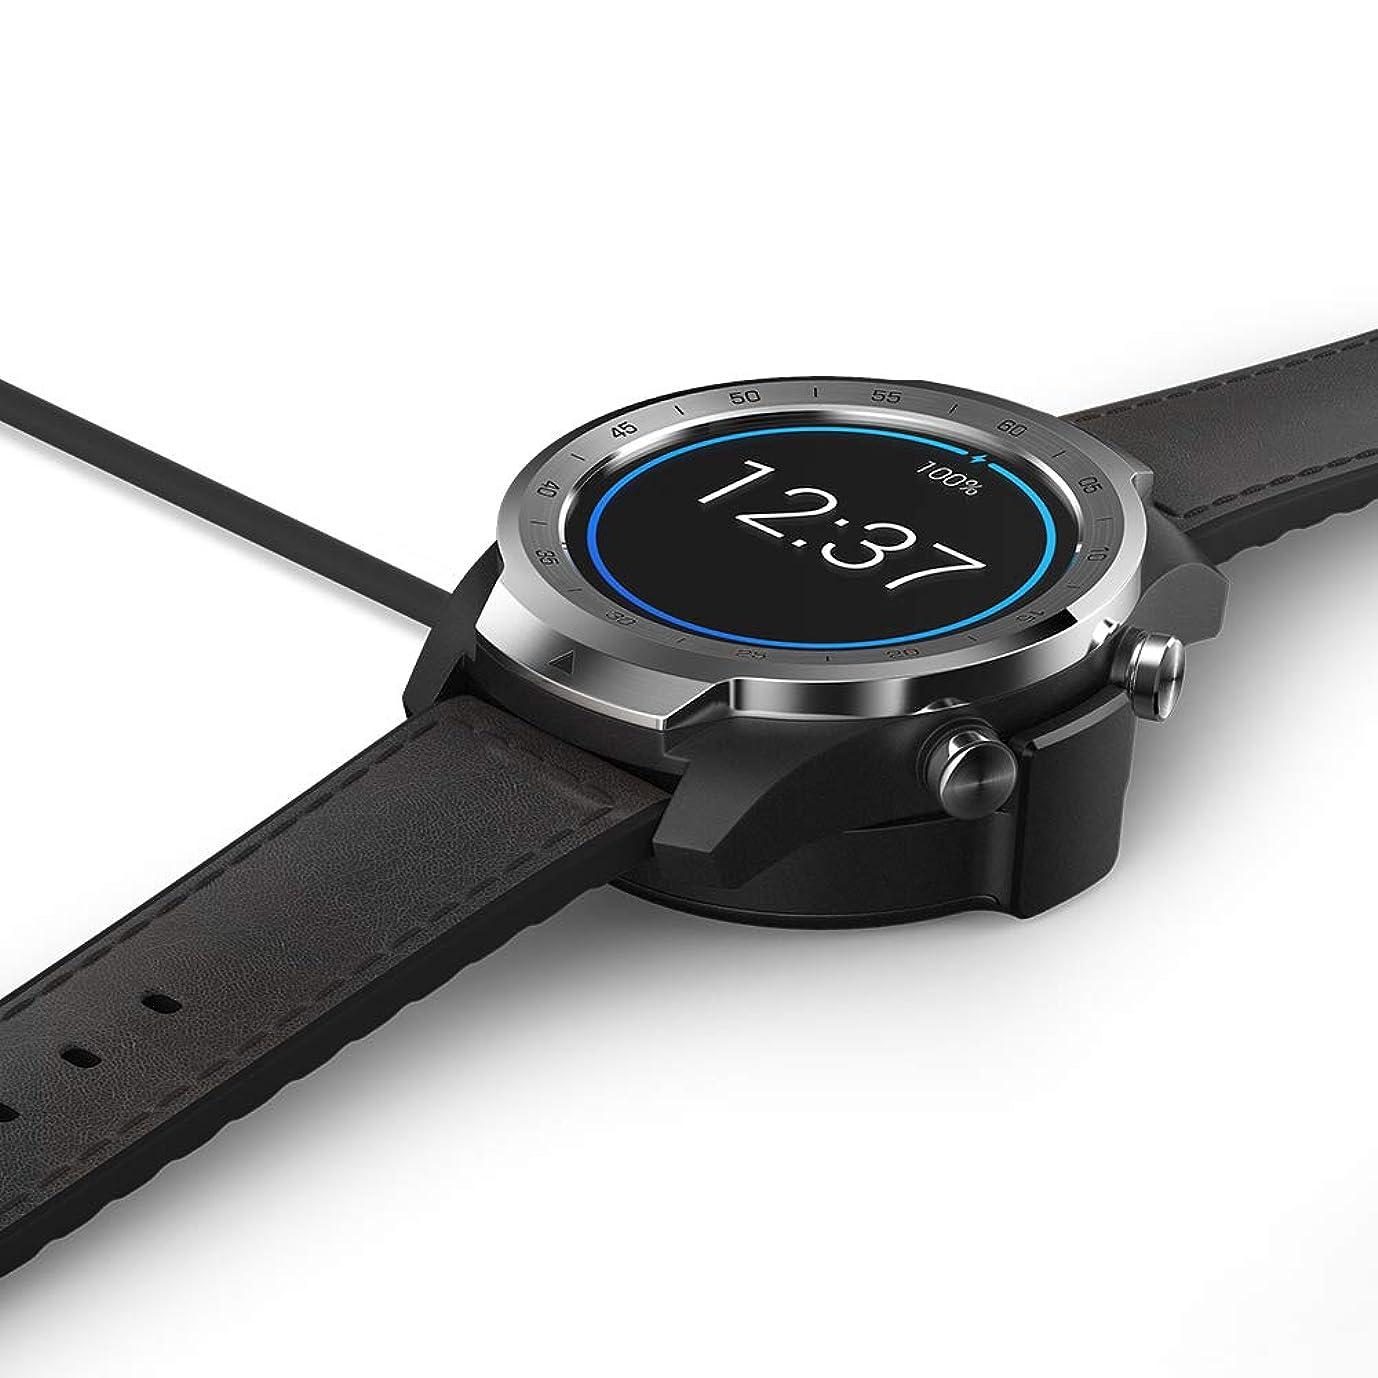 TicWatch Pro充電器 USB充電ケーブル 交換用充電ドック Smartwatchアクセサリー ケーブル TicWatch Pro スマートウォッチ専用